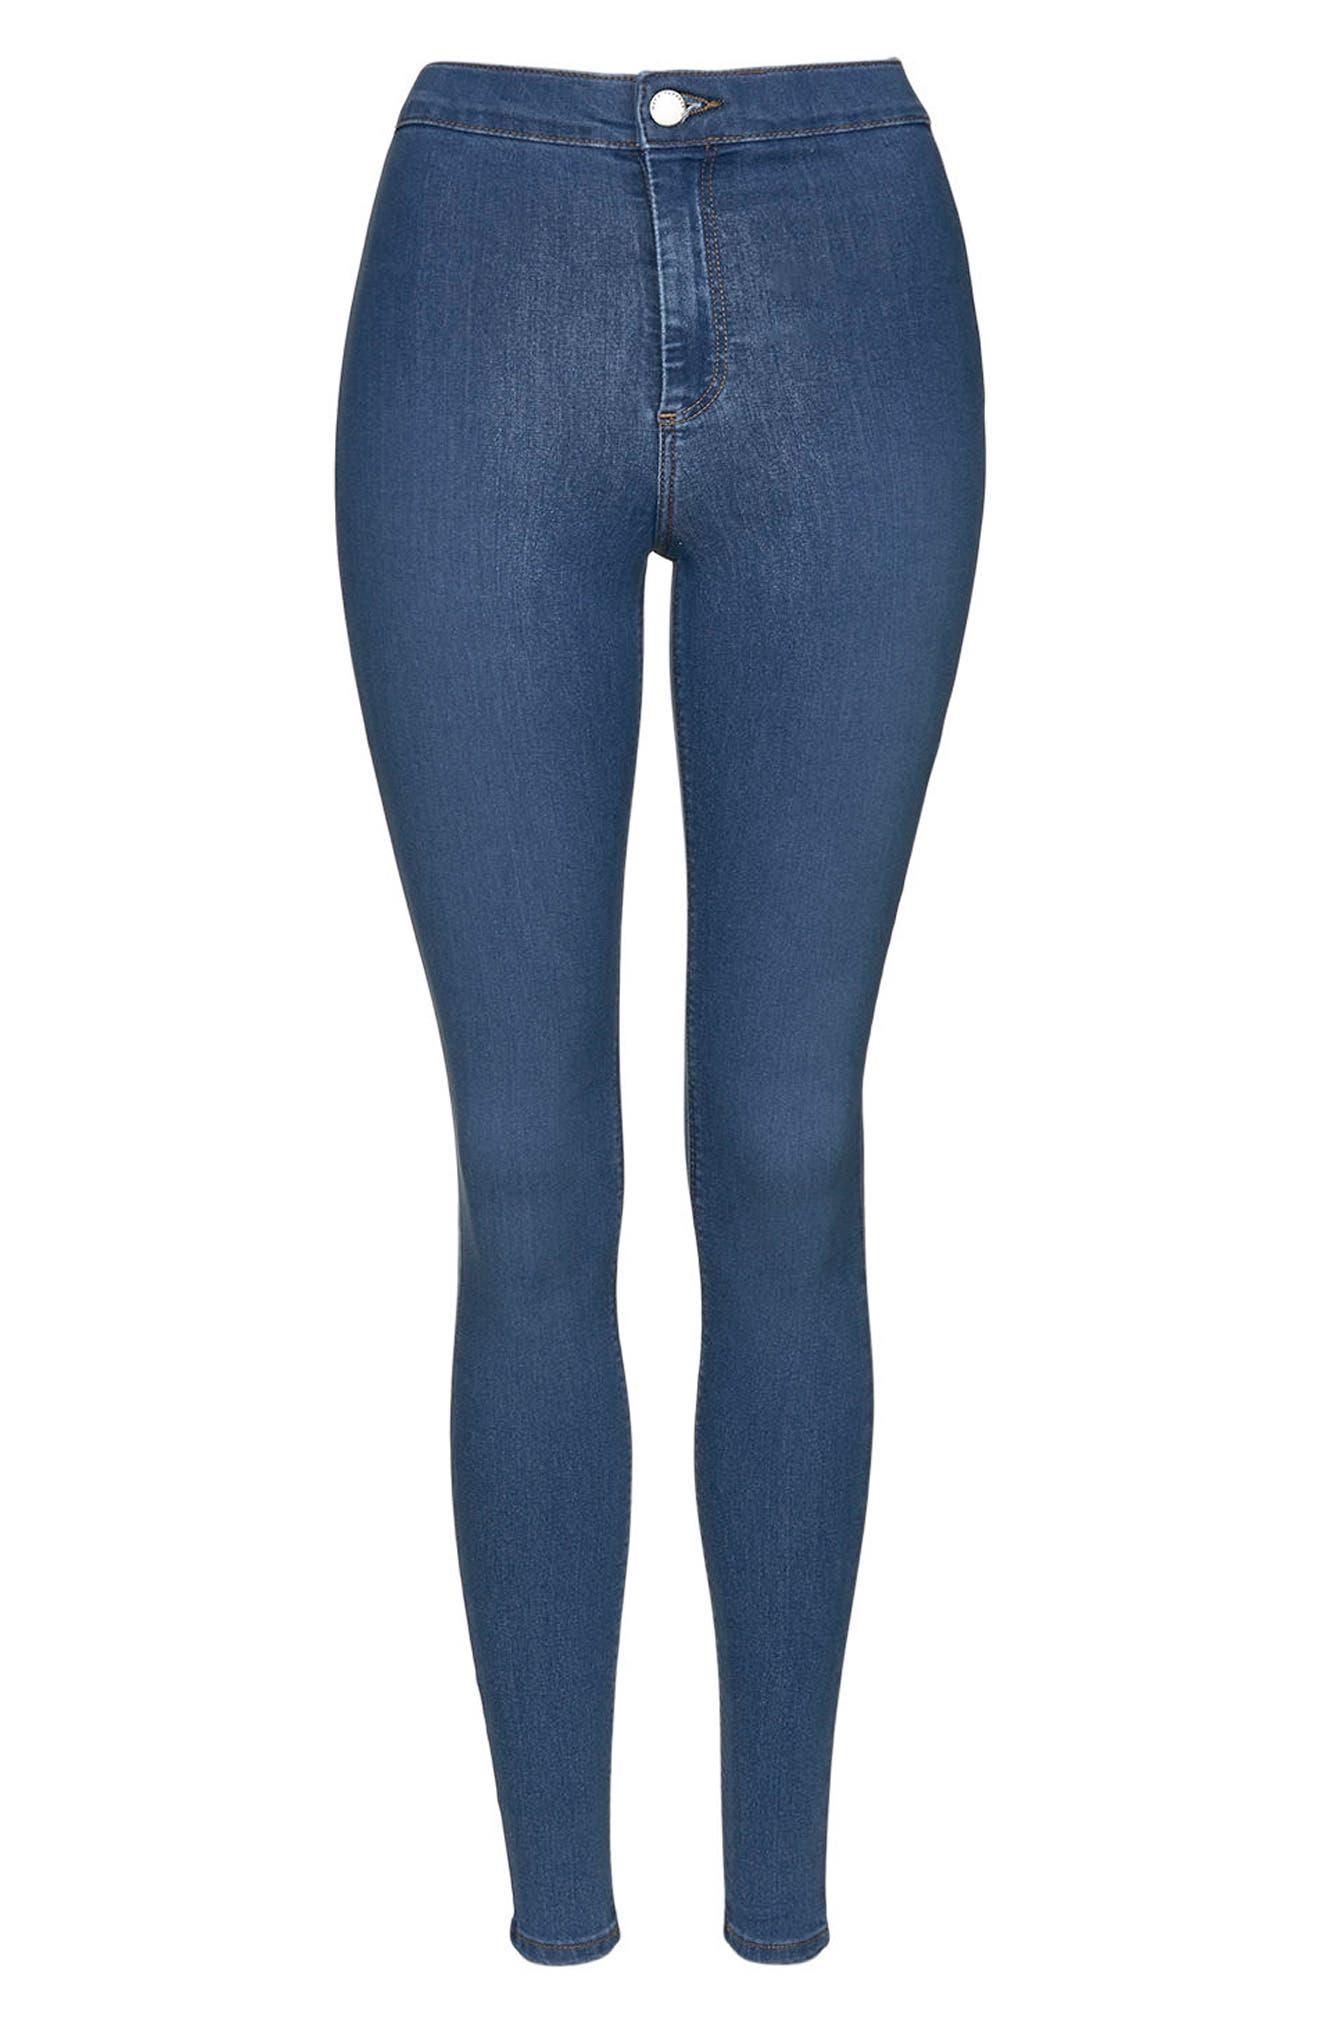 Joni Mid Denim Jeans,                             Alternate thumbnail 5, color,                             Mid Denim